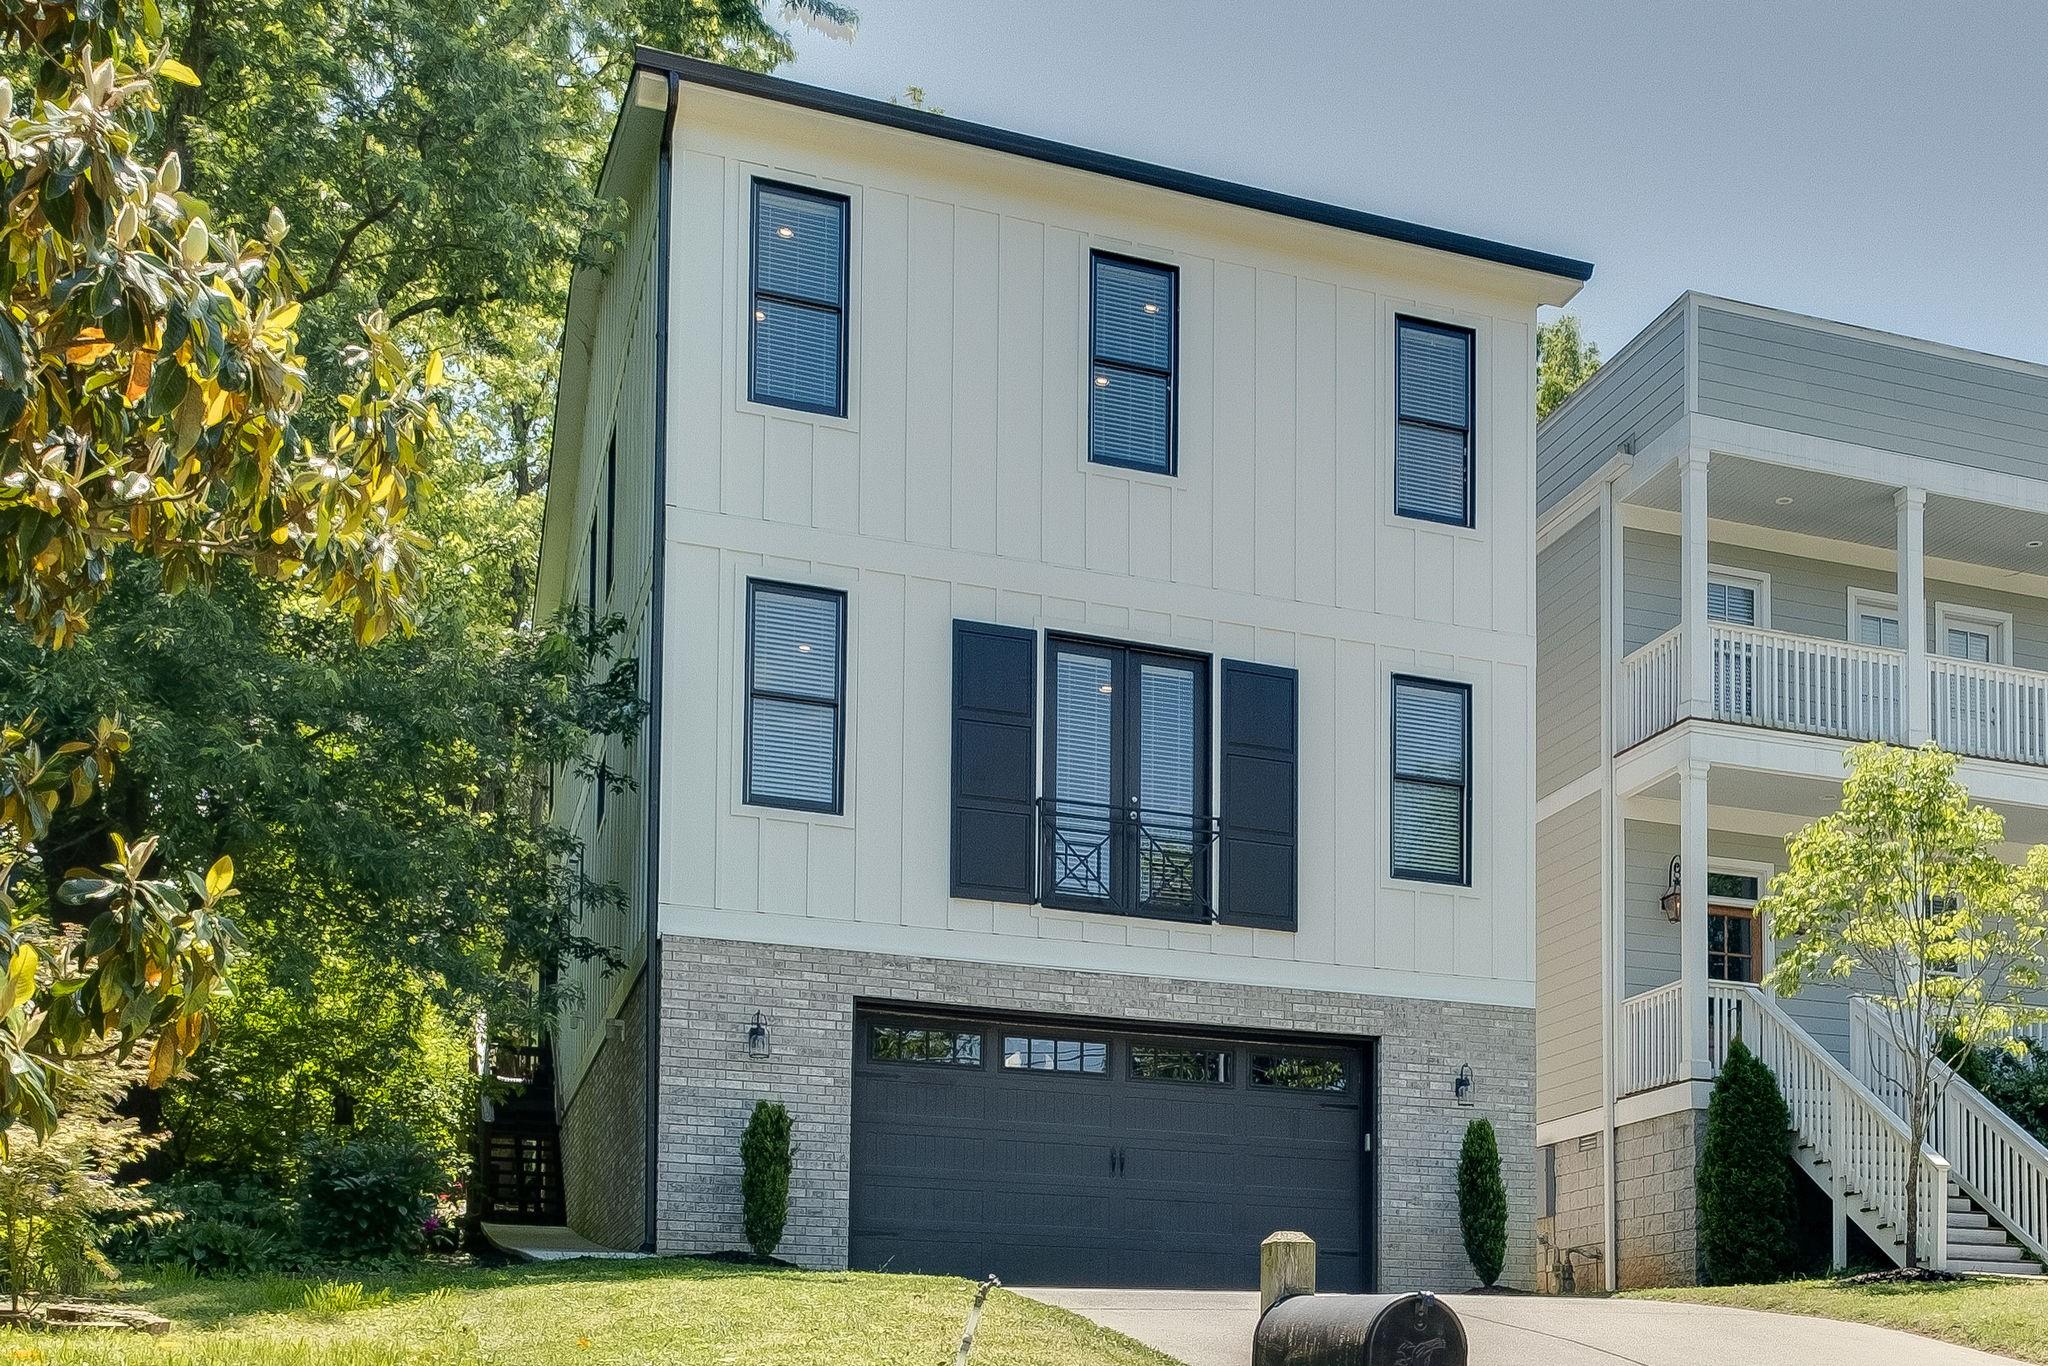 813A Halcyon Ave, Nashville, TN 37204 - Nashville, TN real estate listing